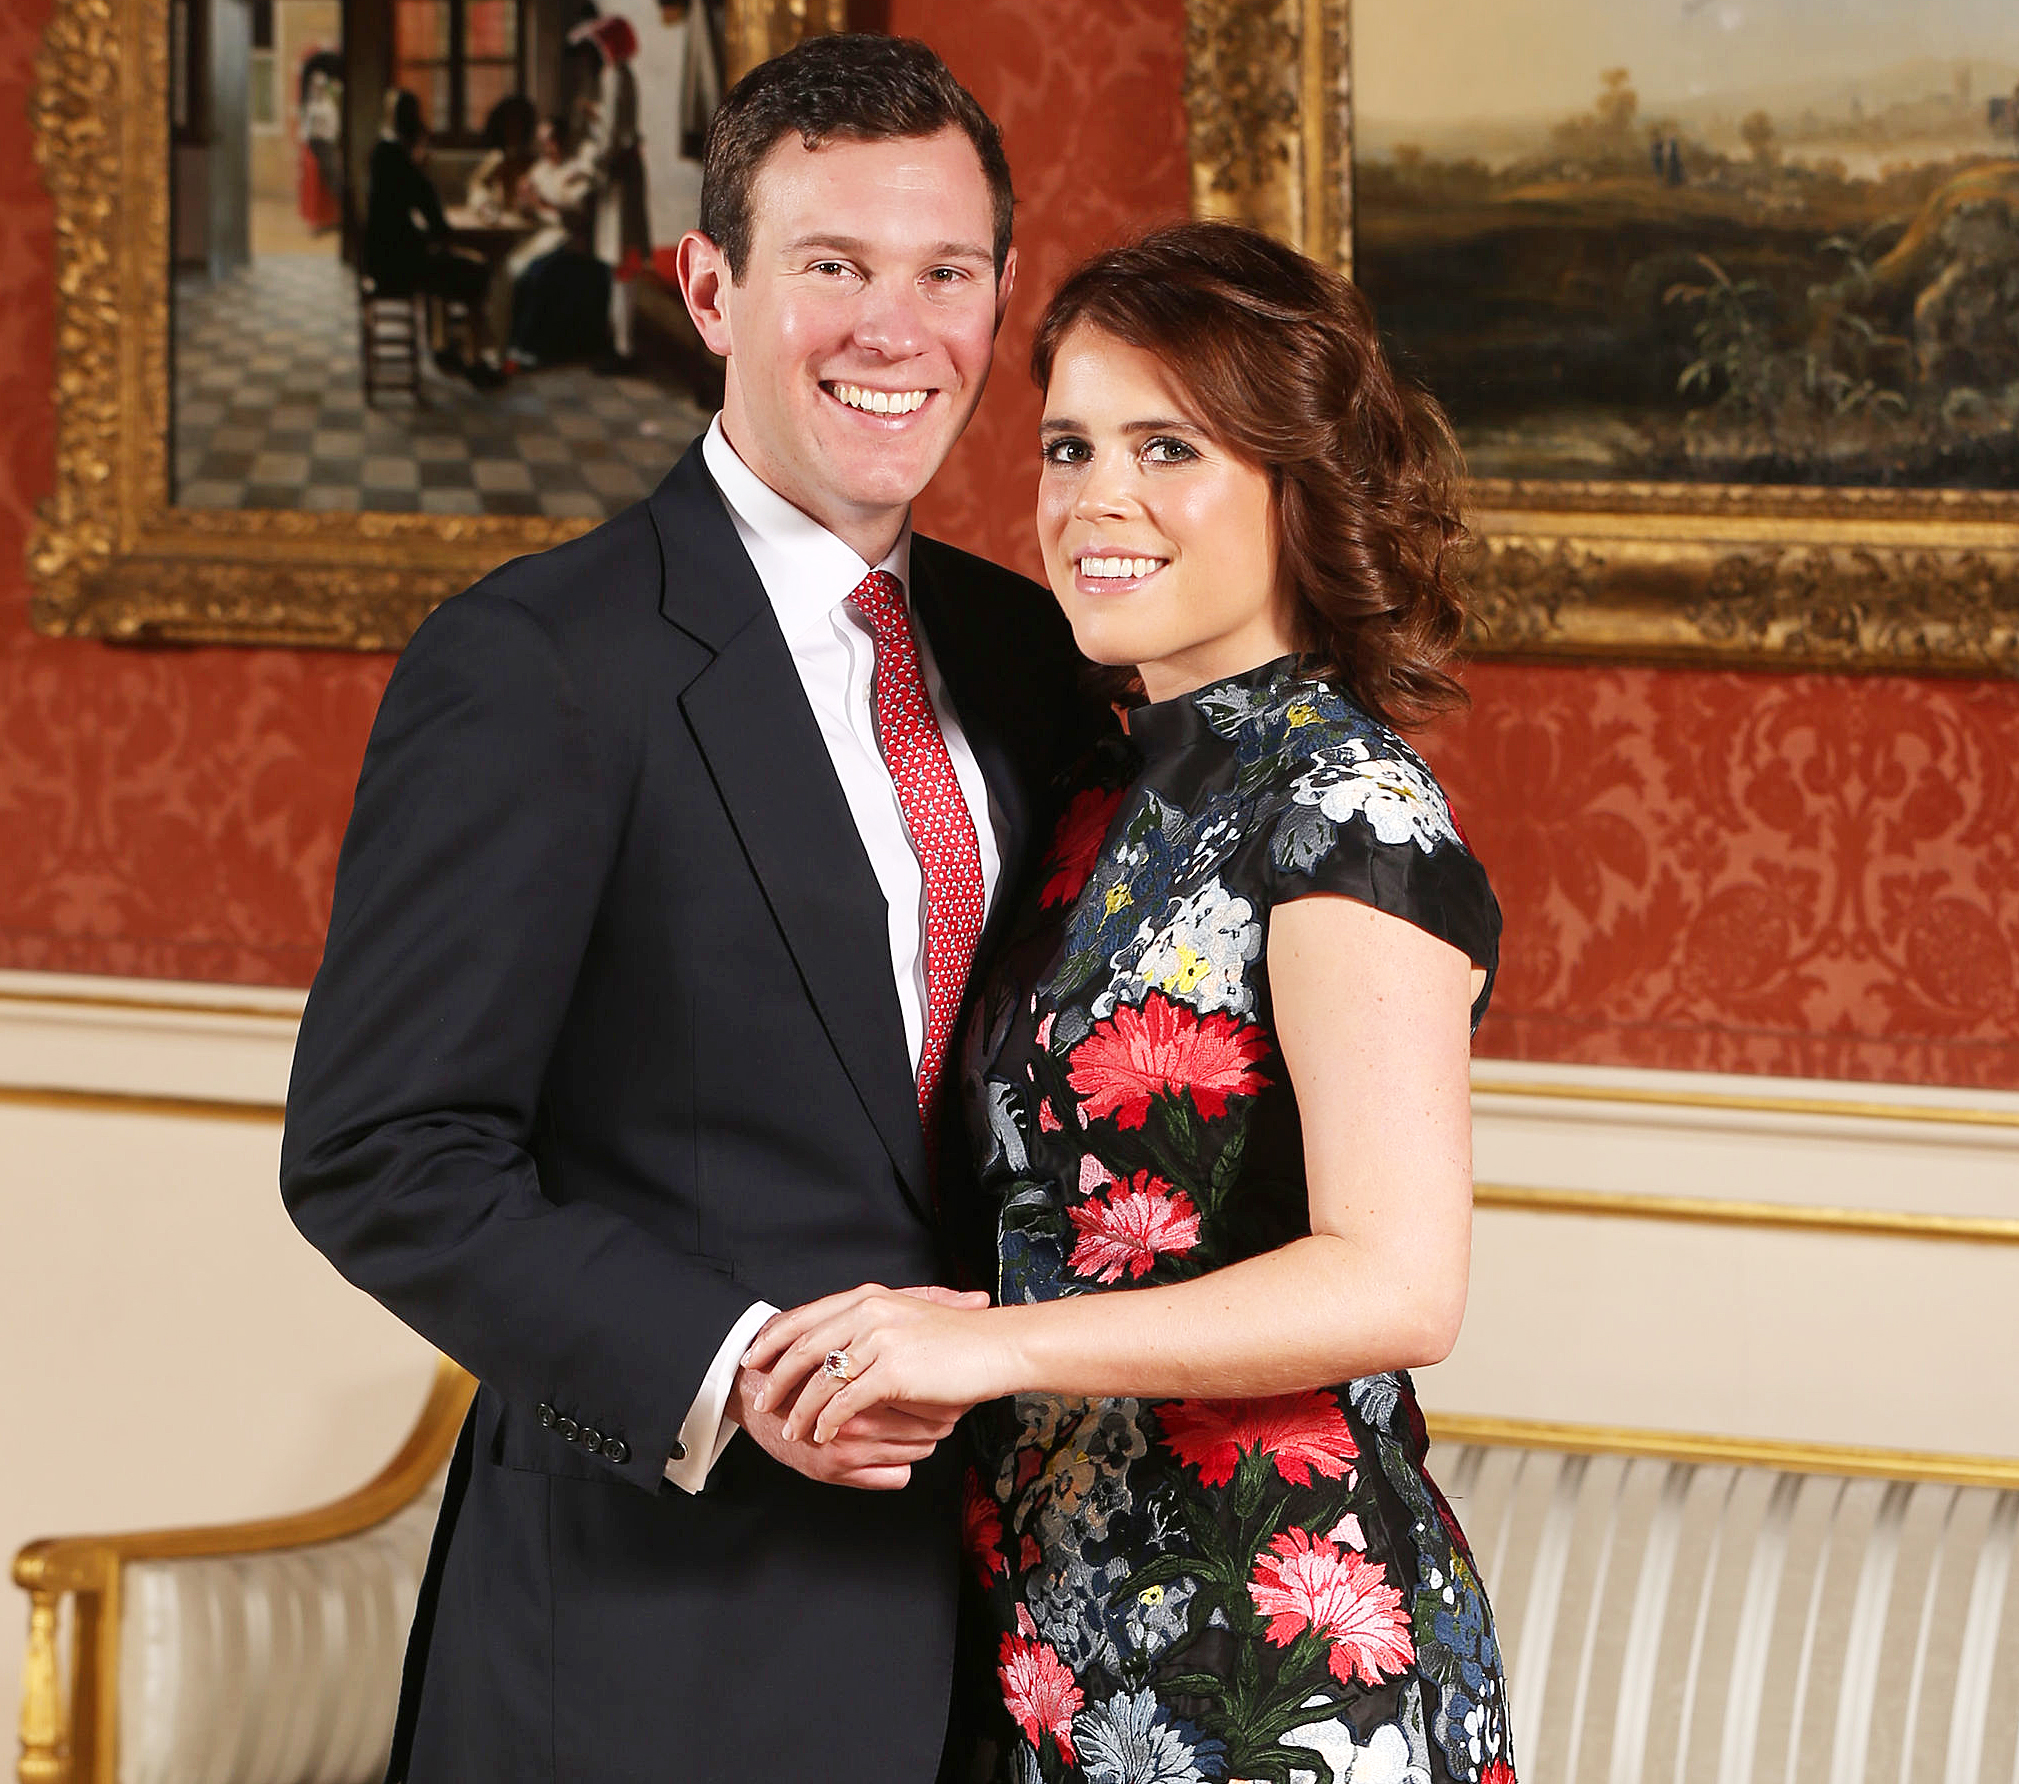 Princess Eugenie Jack Brooksbank Prince George Princess Charlotte Wedding Roles